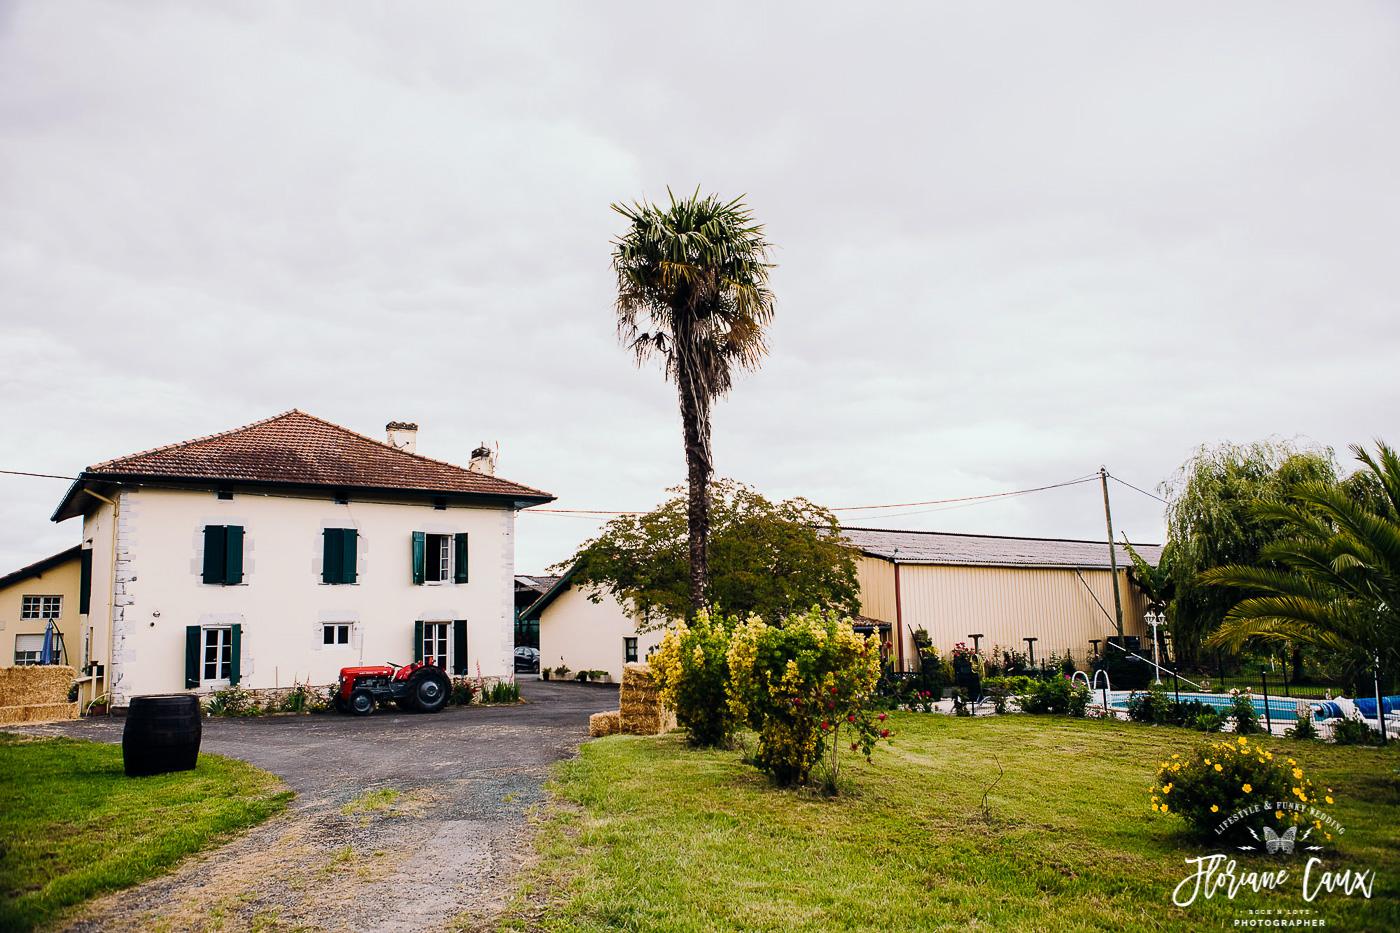 photographe-mariage-pays-basque-Floriane-Caux (5)